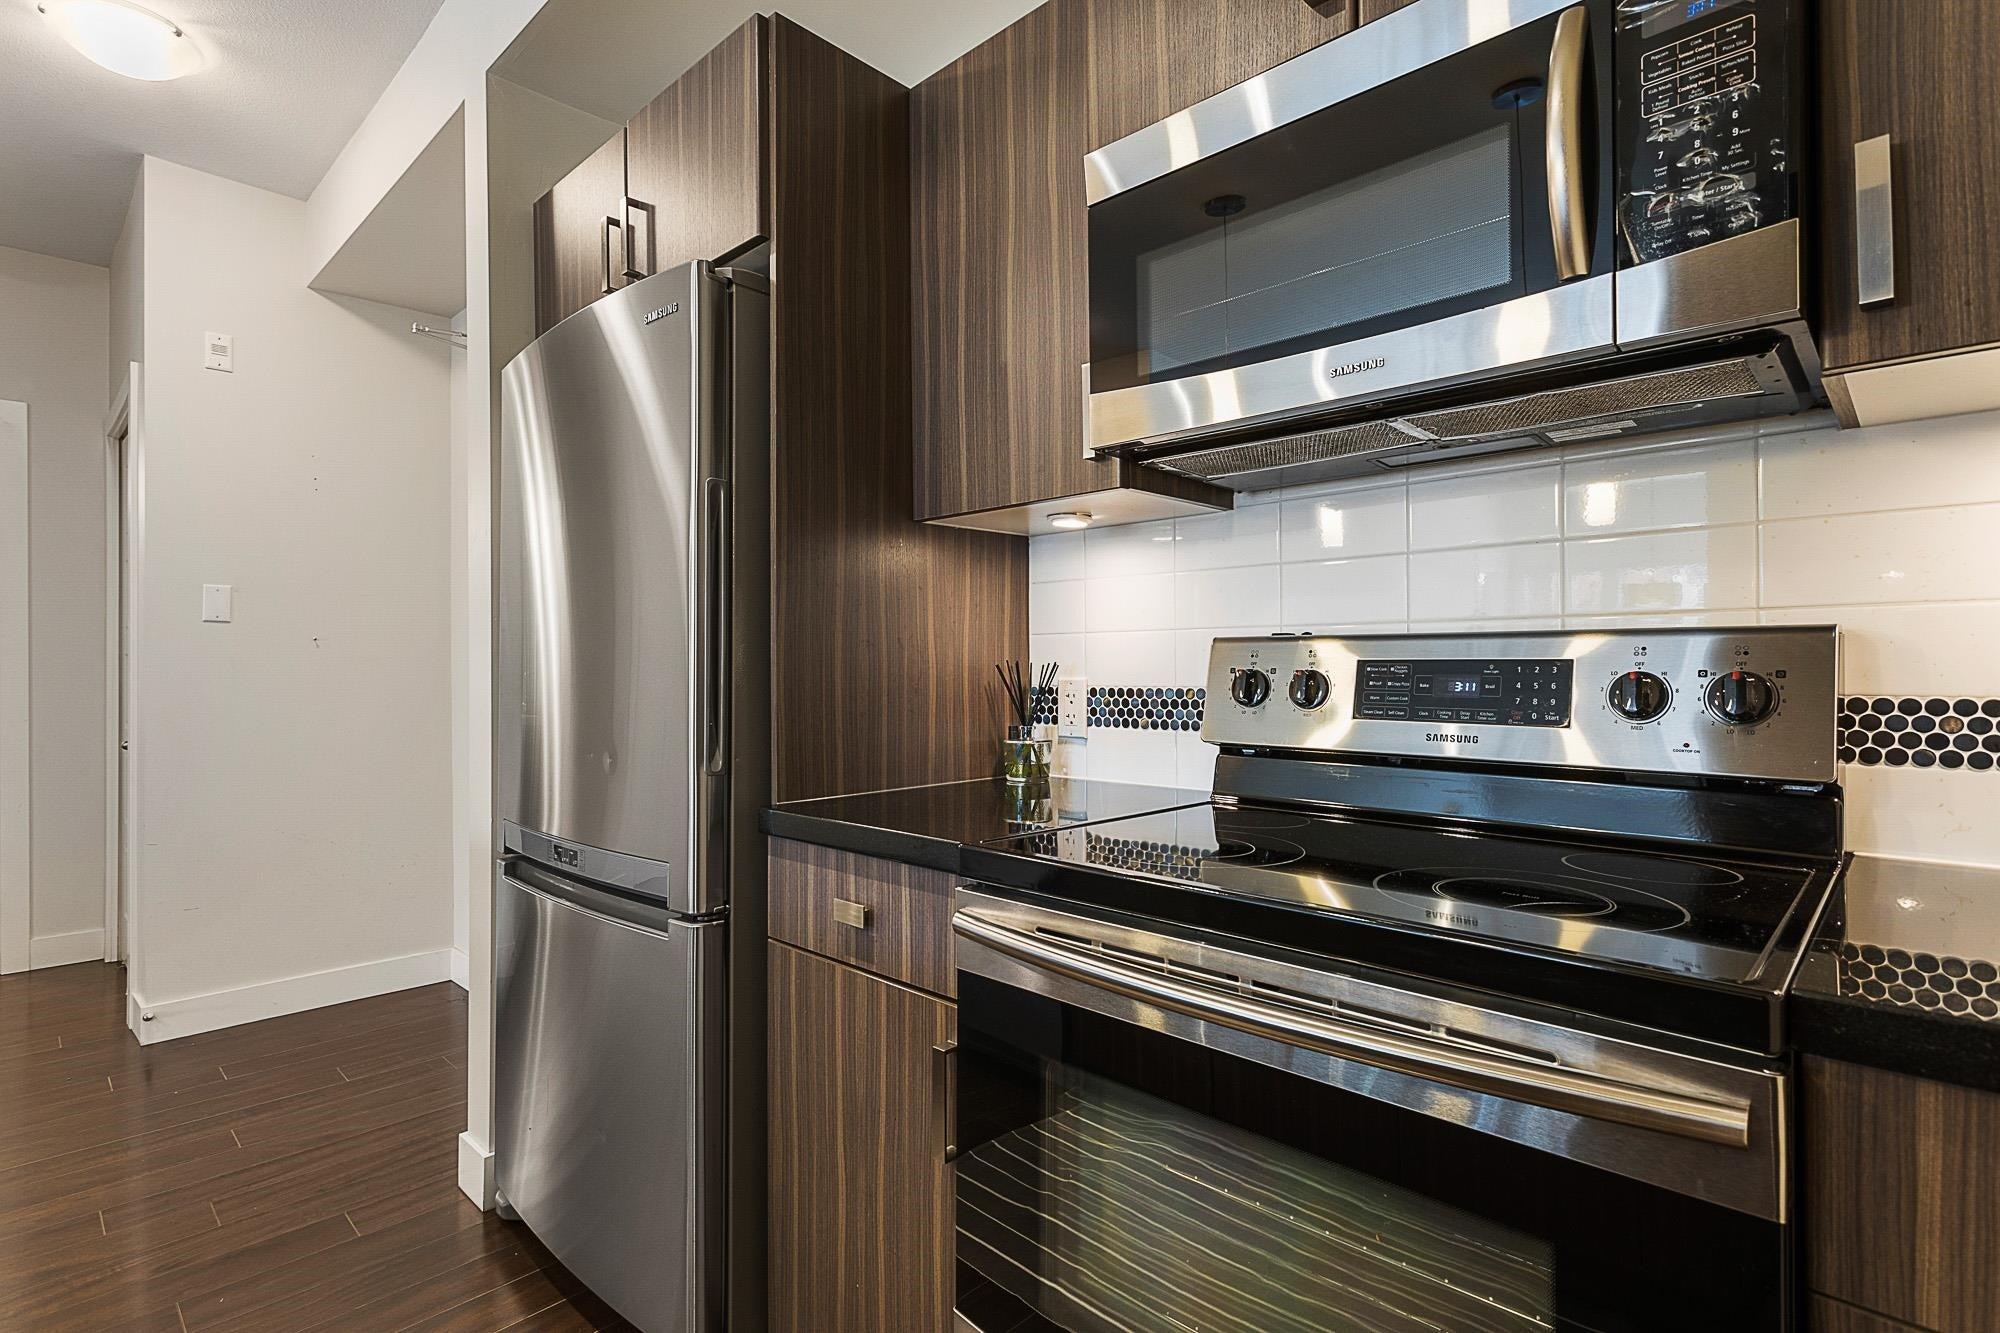 114 20219 54A AVENUE - Langley City Apartment/Condo for sale, 1 Bedroom (R2616172) - #6